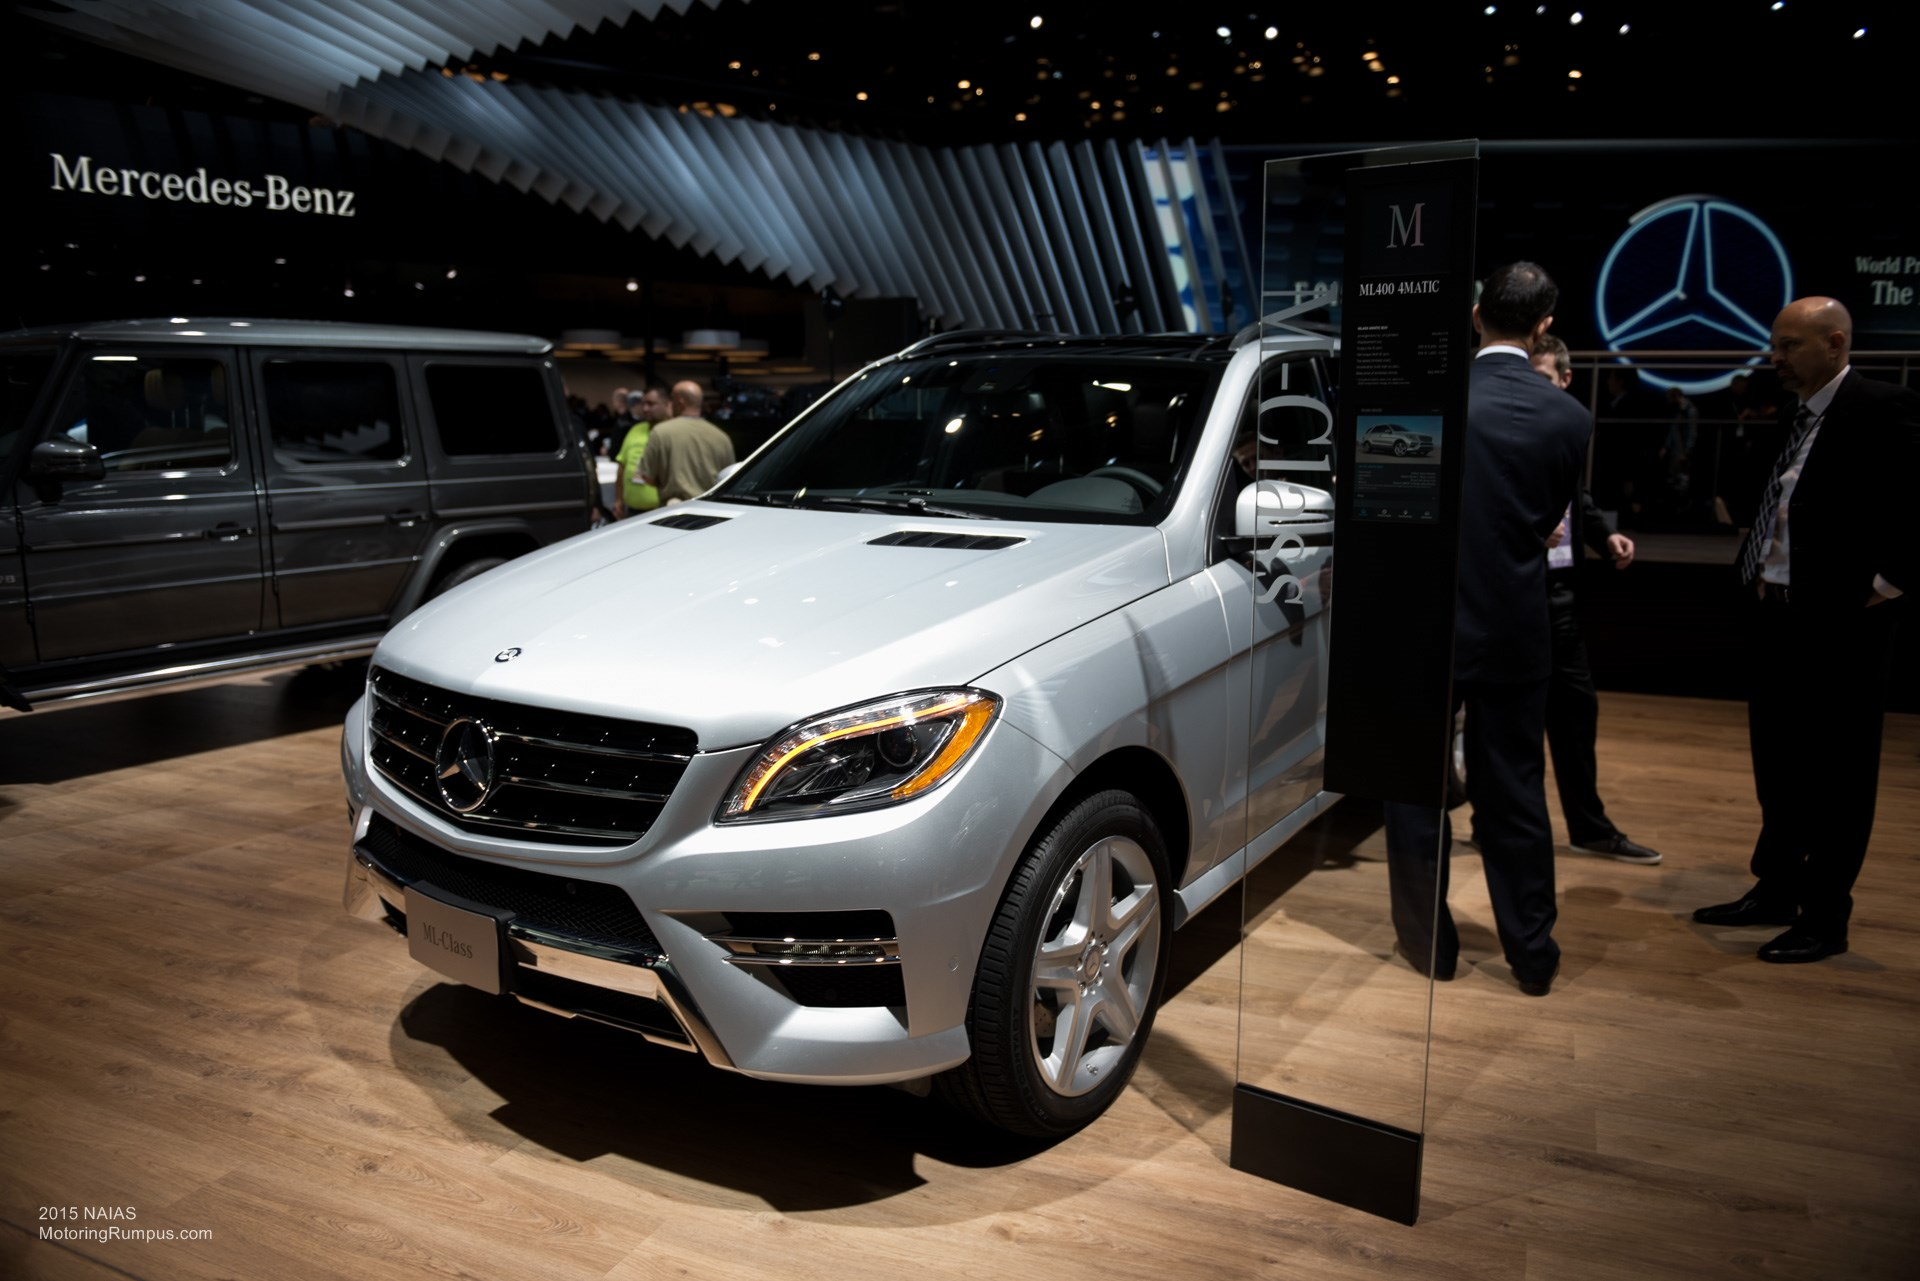 2015 NAIAS Mercedes-Benz ML400